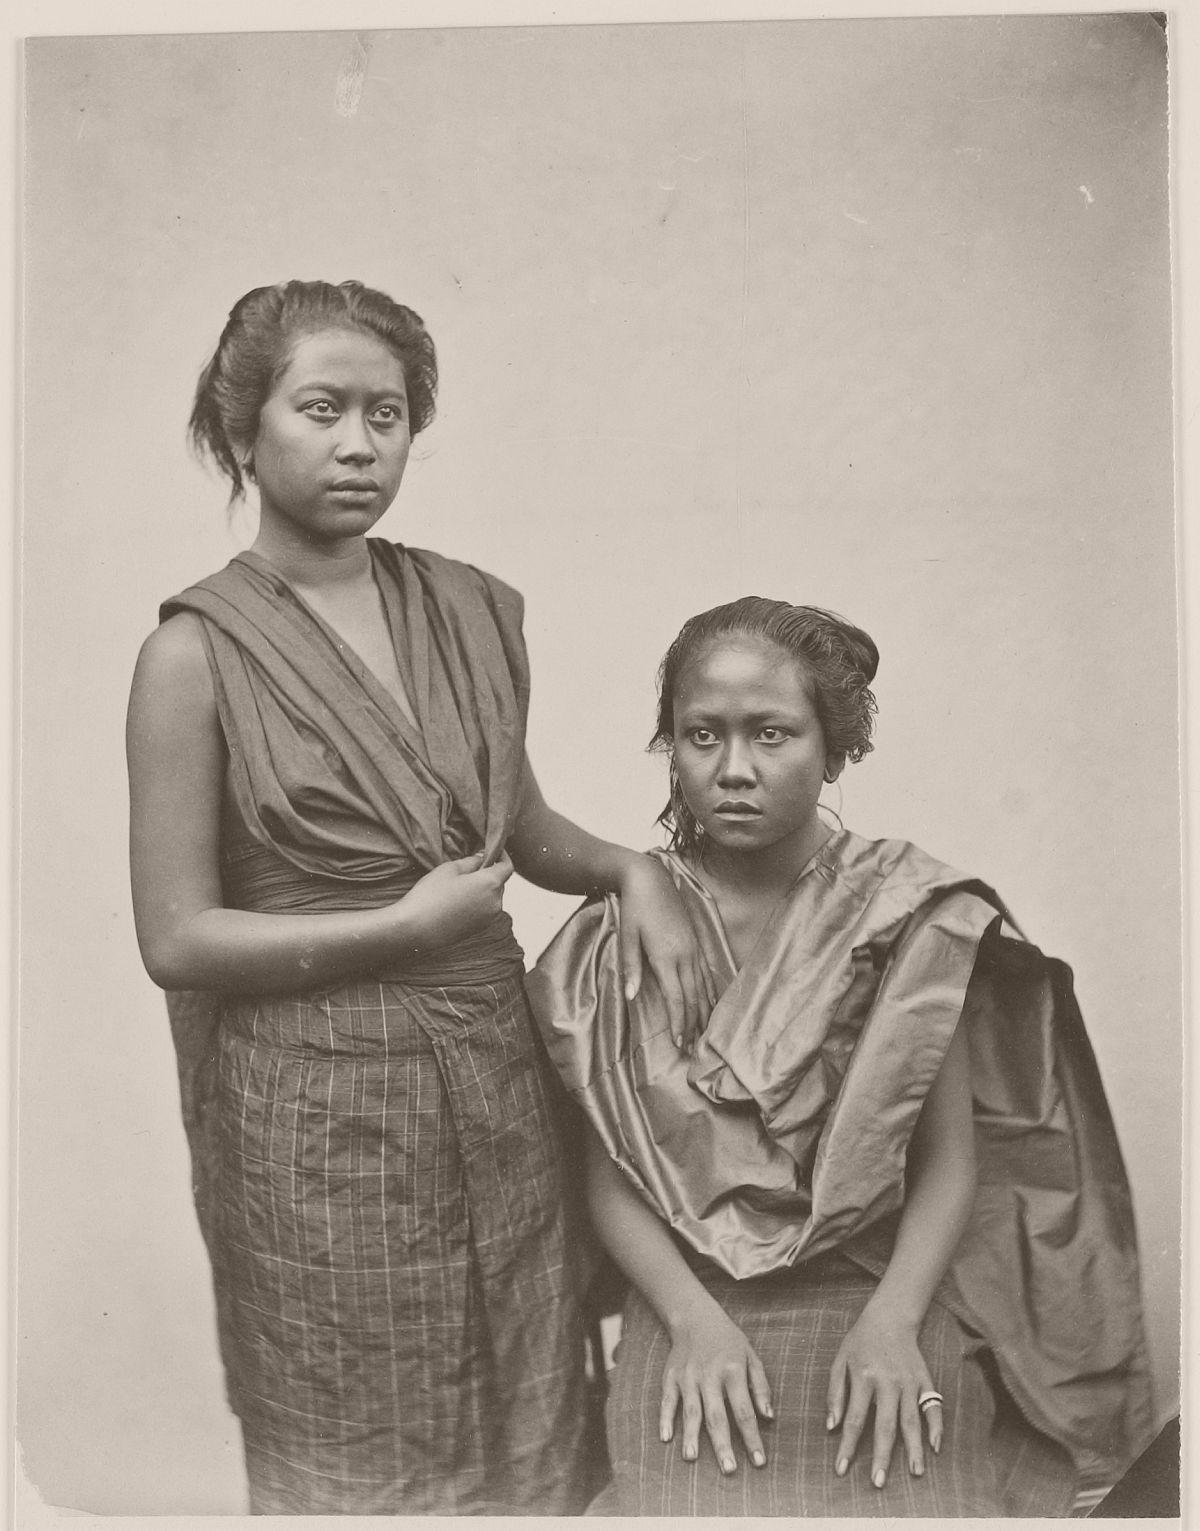 Balinese women, circa 1870.